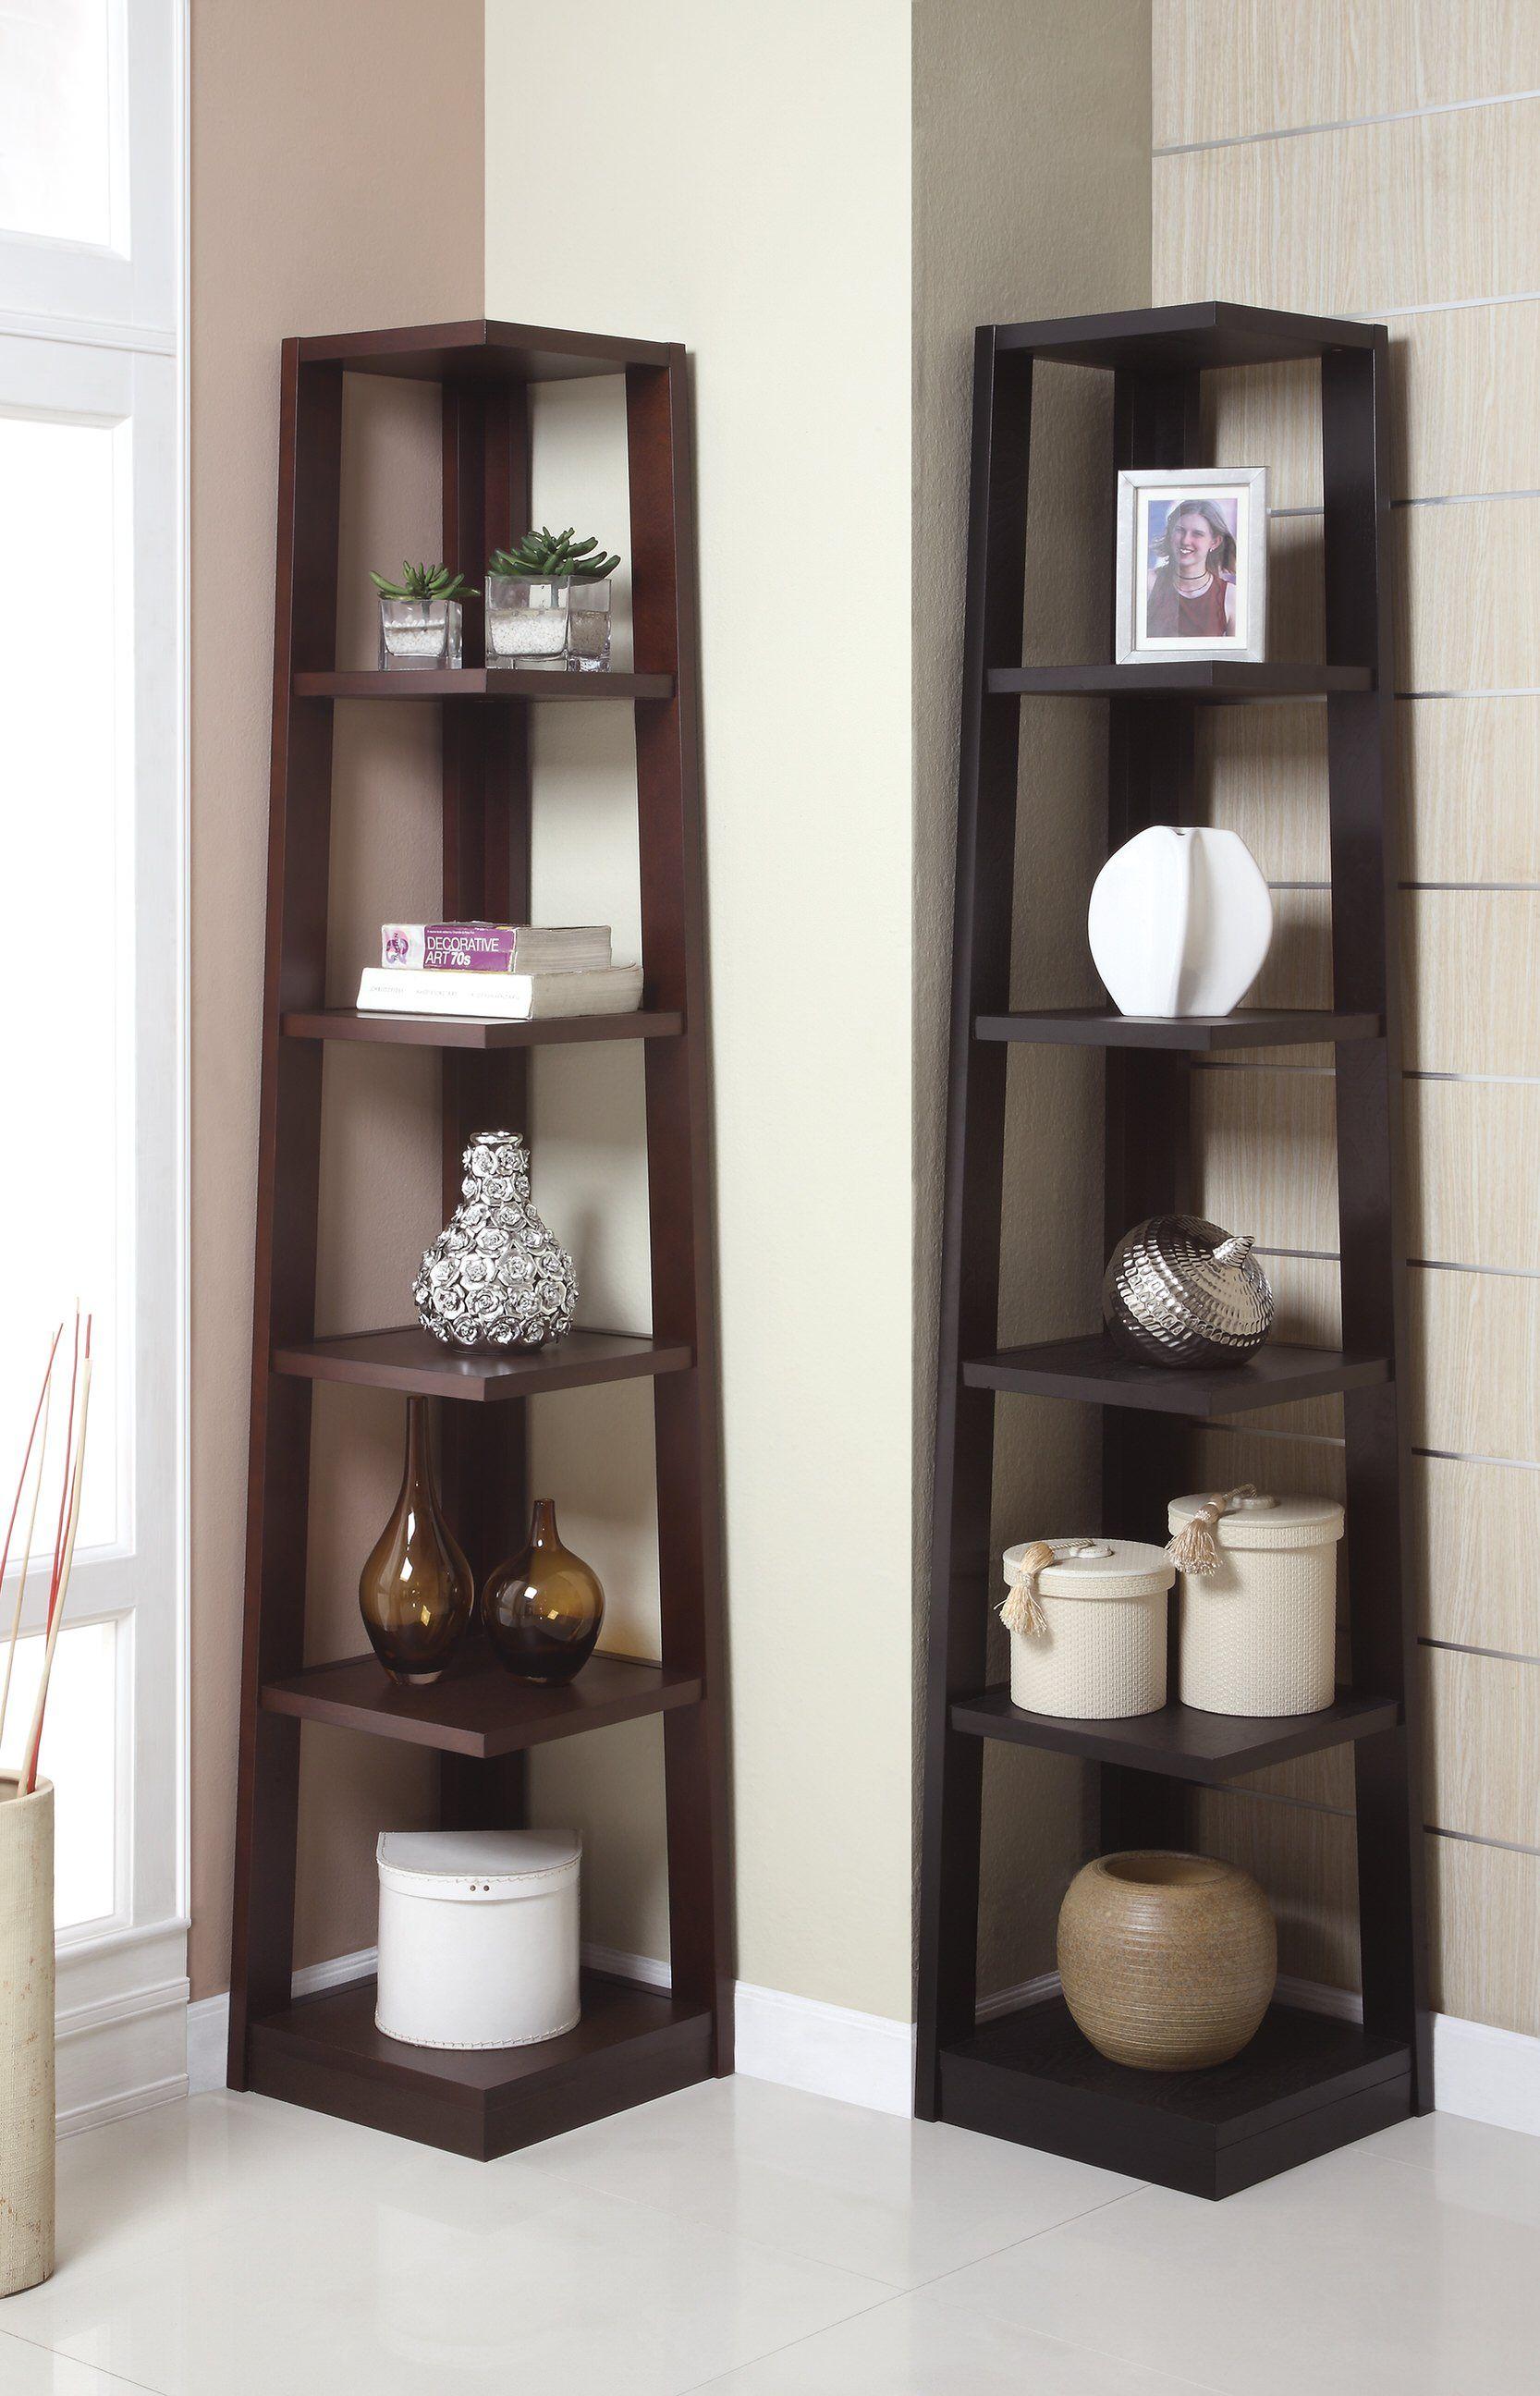 F4613 Walnut Book Shelf By Poundex Dengan Gambar Perabot Rumah Dekorasi Rumah Buatan Sendiri Interior #tall #shelves #for #living #room